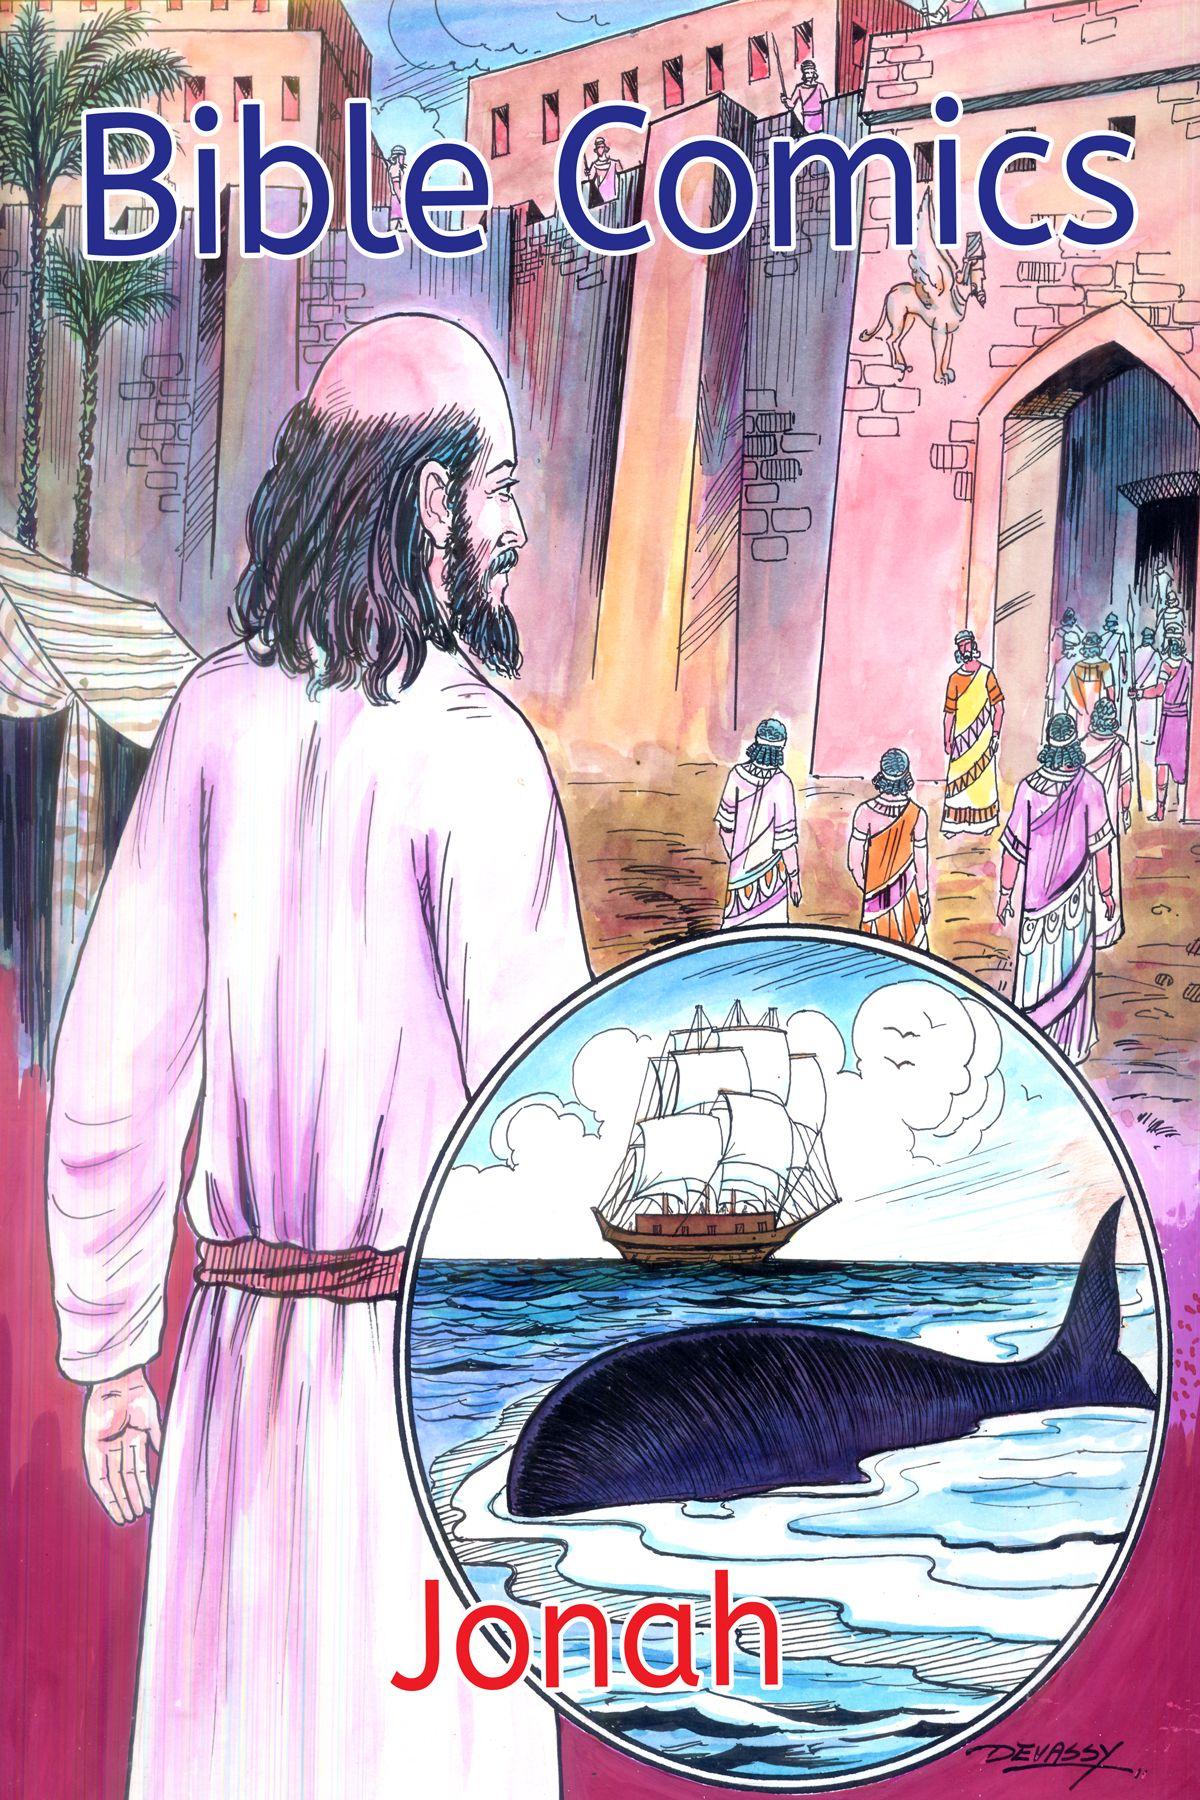 Moderno Jonah Para Colorear Imprimible Imágenes - Ideas Para ...